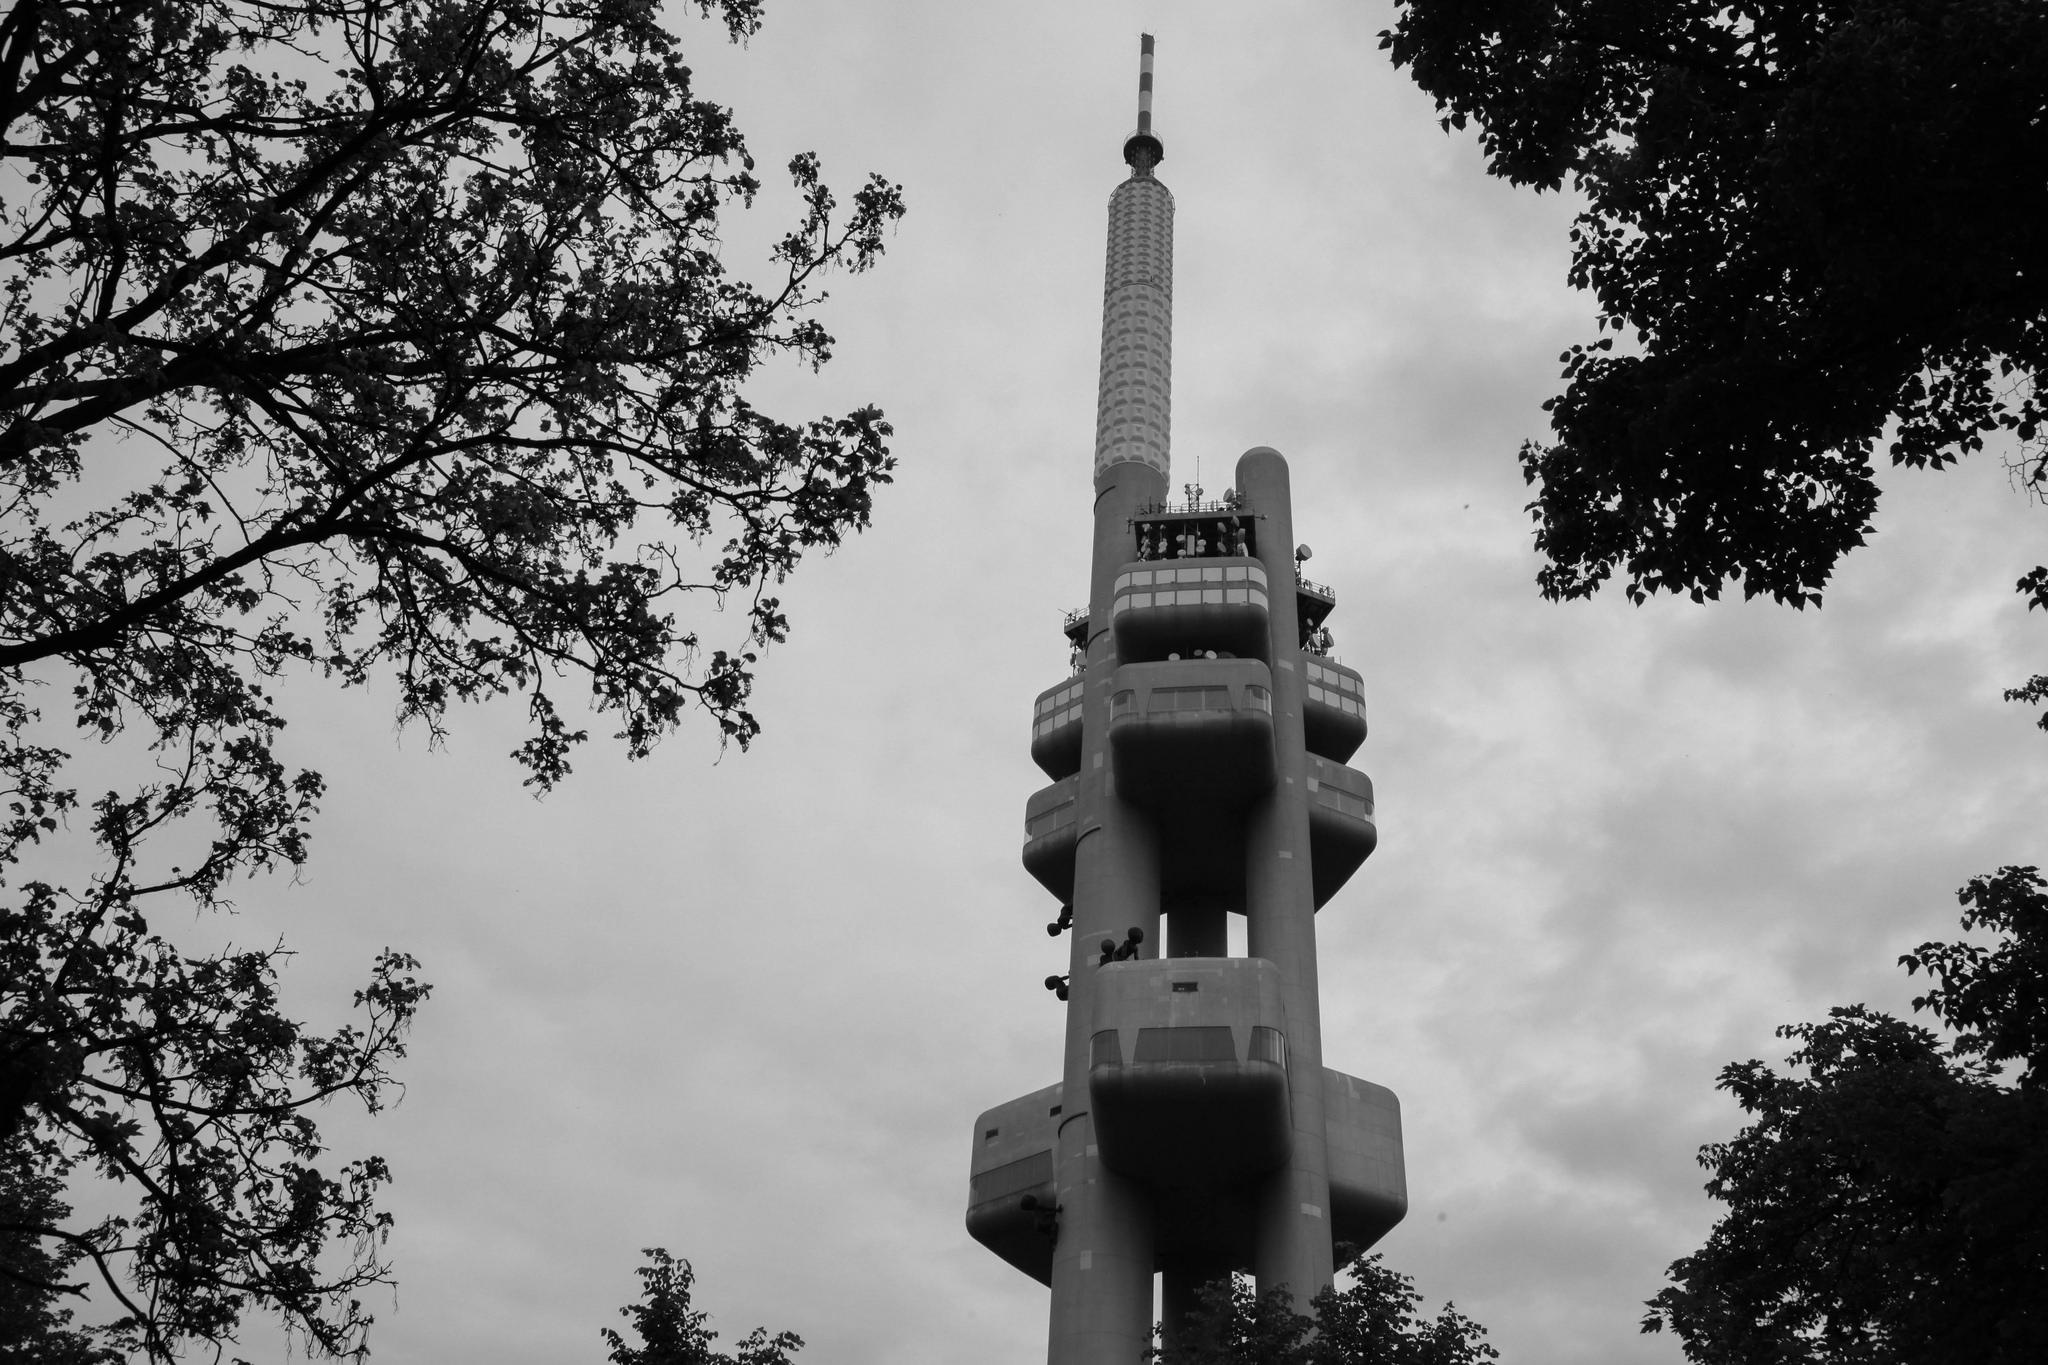 Brutalism_Žižkov Television Tower_Prague.jpg